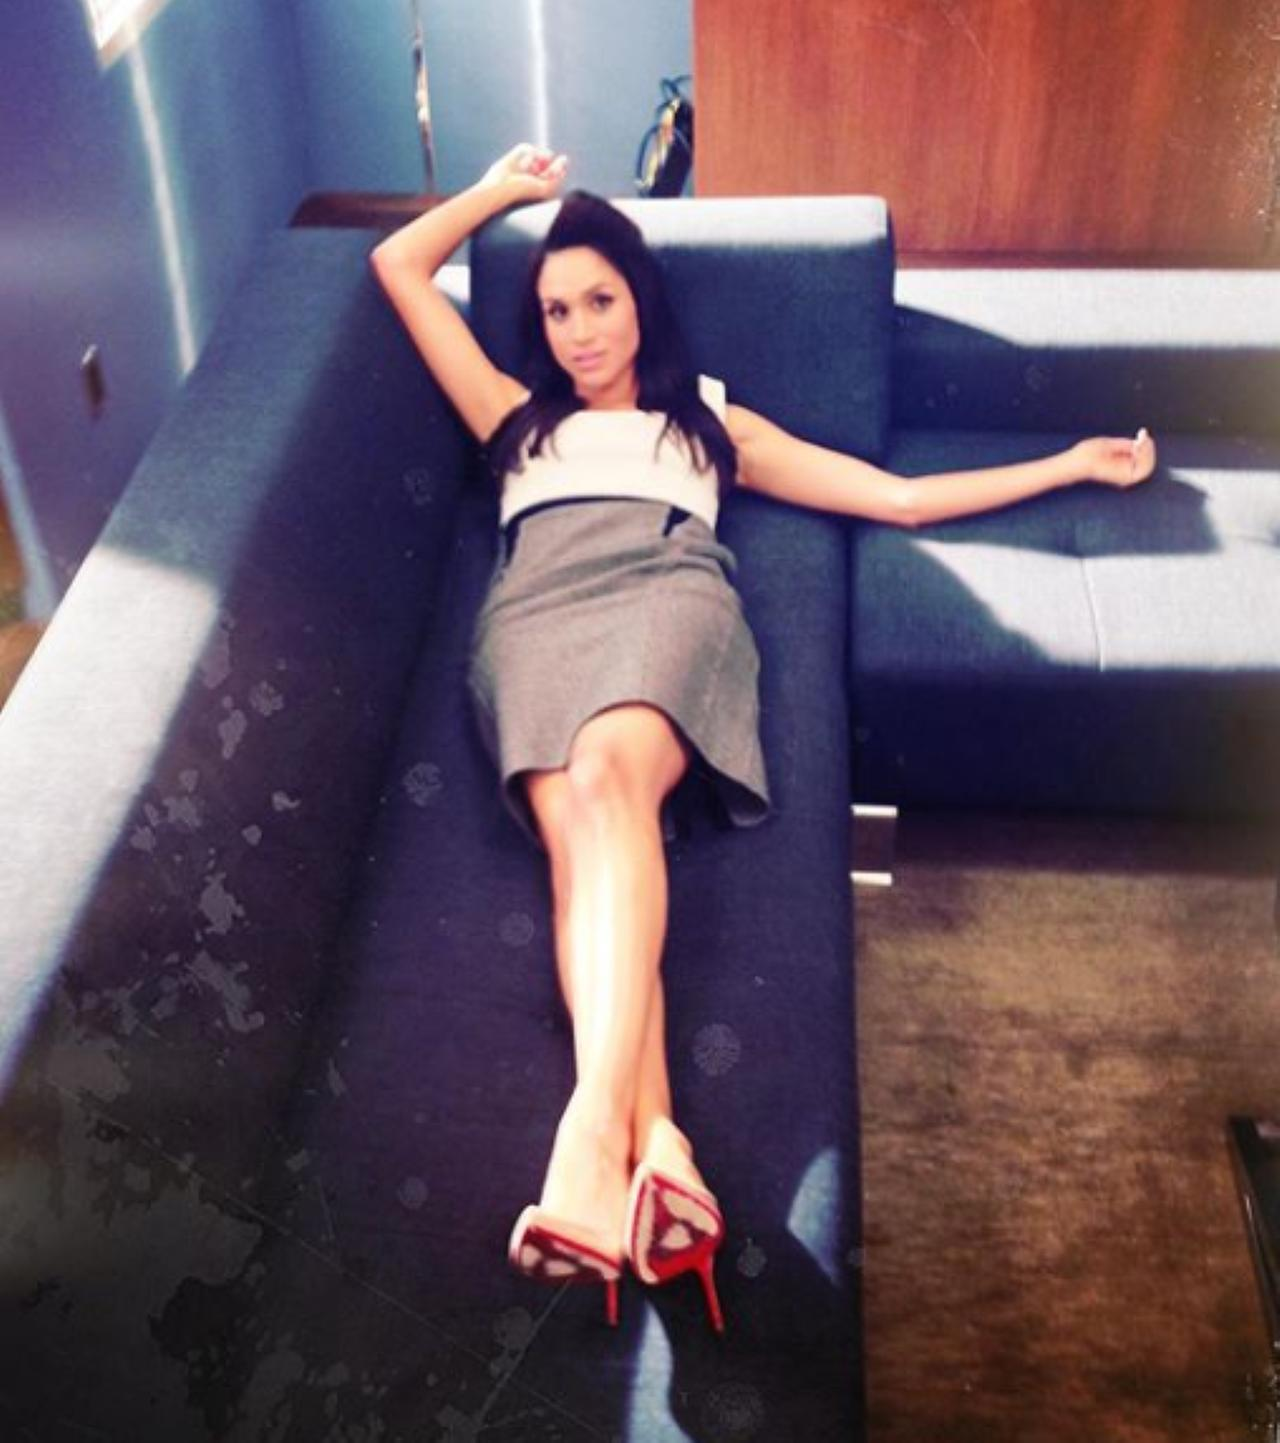 Images : 2番目の画像 - メーガン妃が床に寝っ転がる!バスローブ姿になる!俳優仲間がお宝写真を大量公開 - フロントロウ -海外セレブ情報を発信